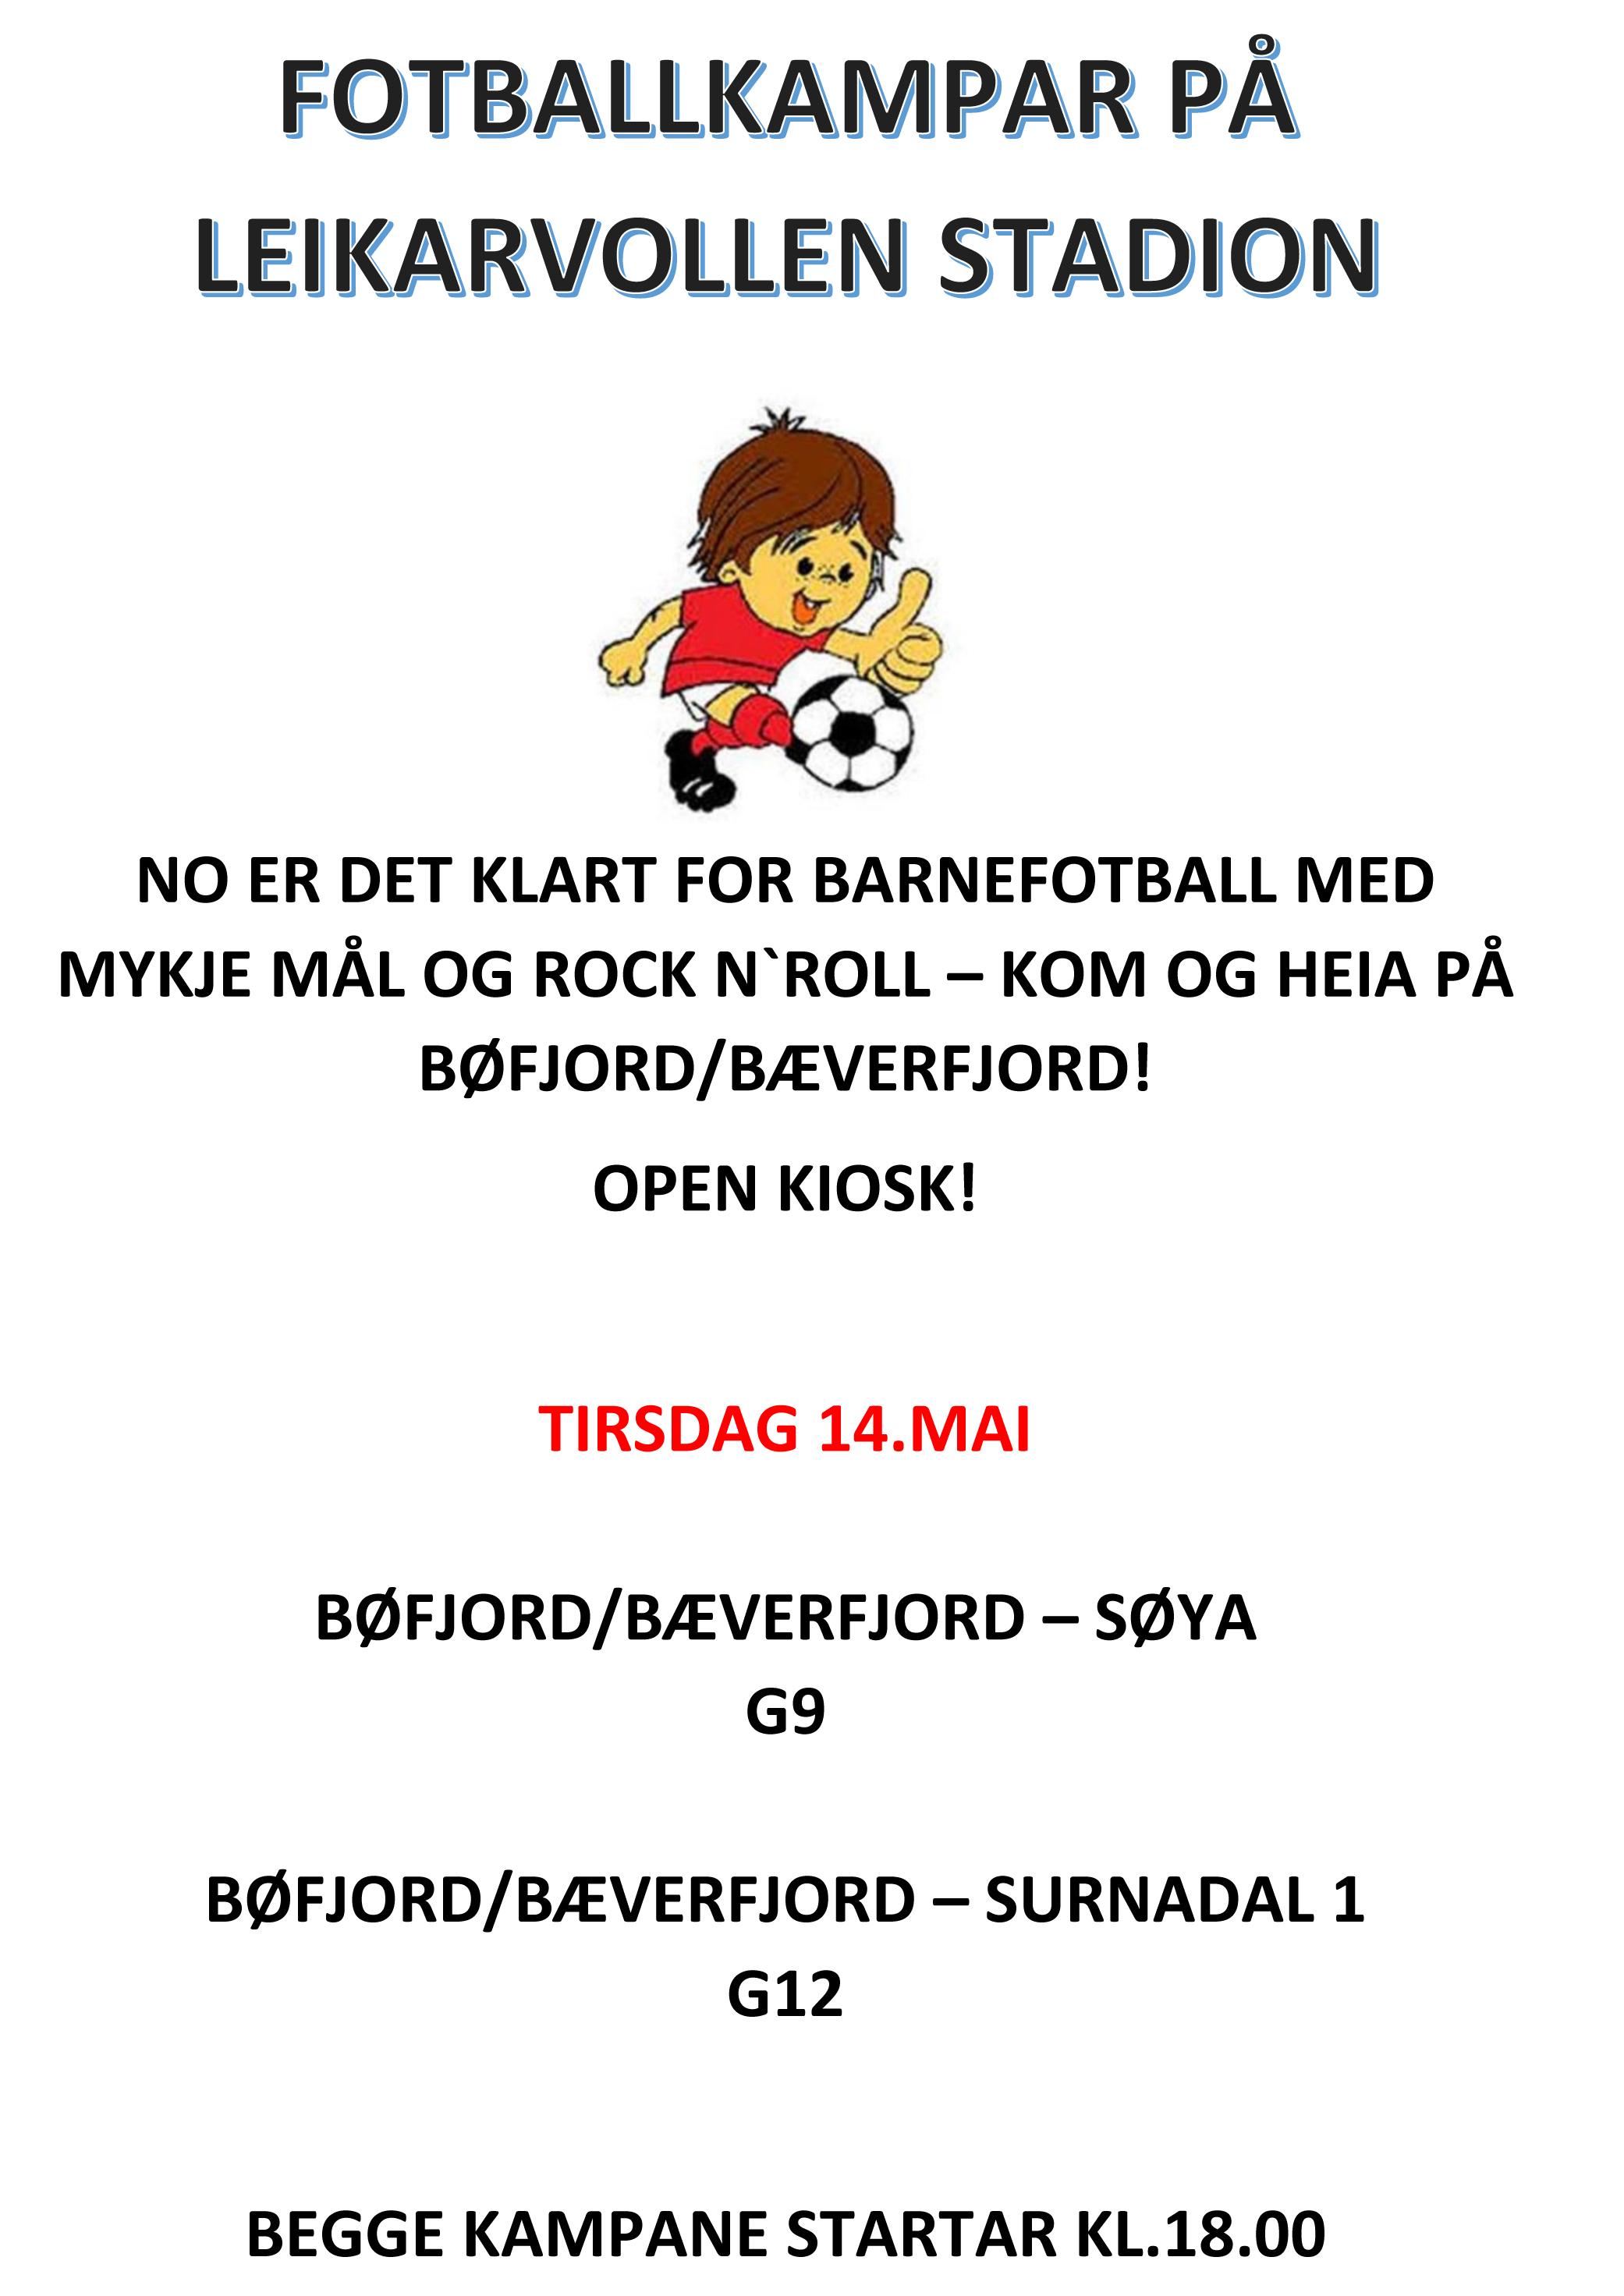 Plakat - Barnefotballen - Leikarvollen Stadion.jpg